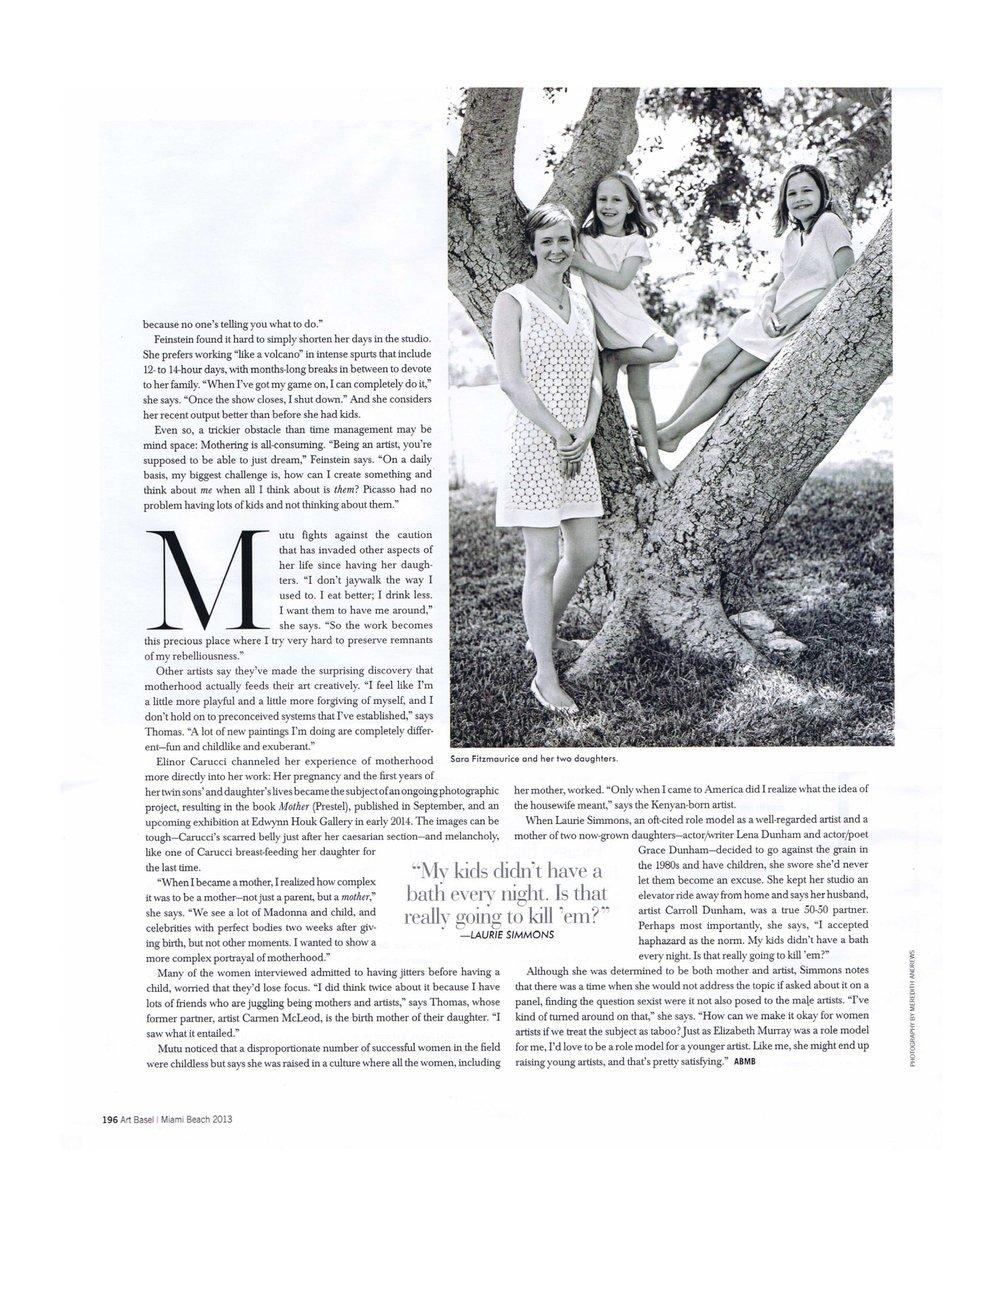 ABMB magazine_Yvonne_December 2013 5.jpeg